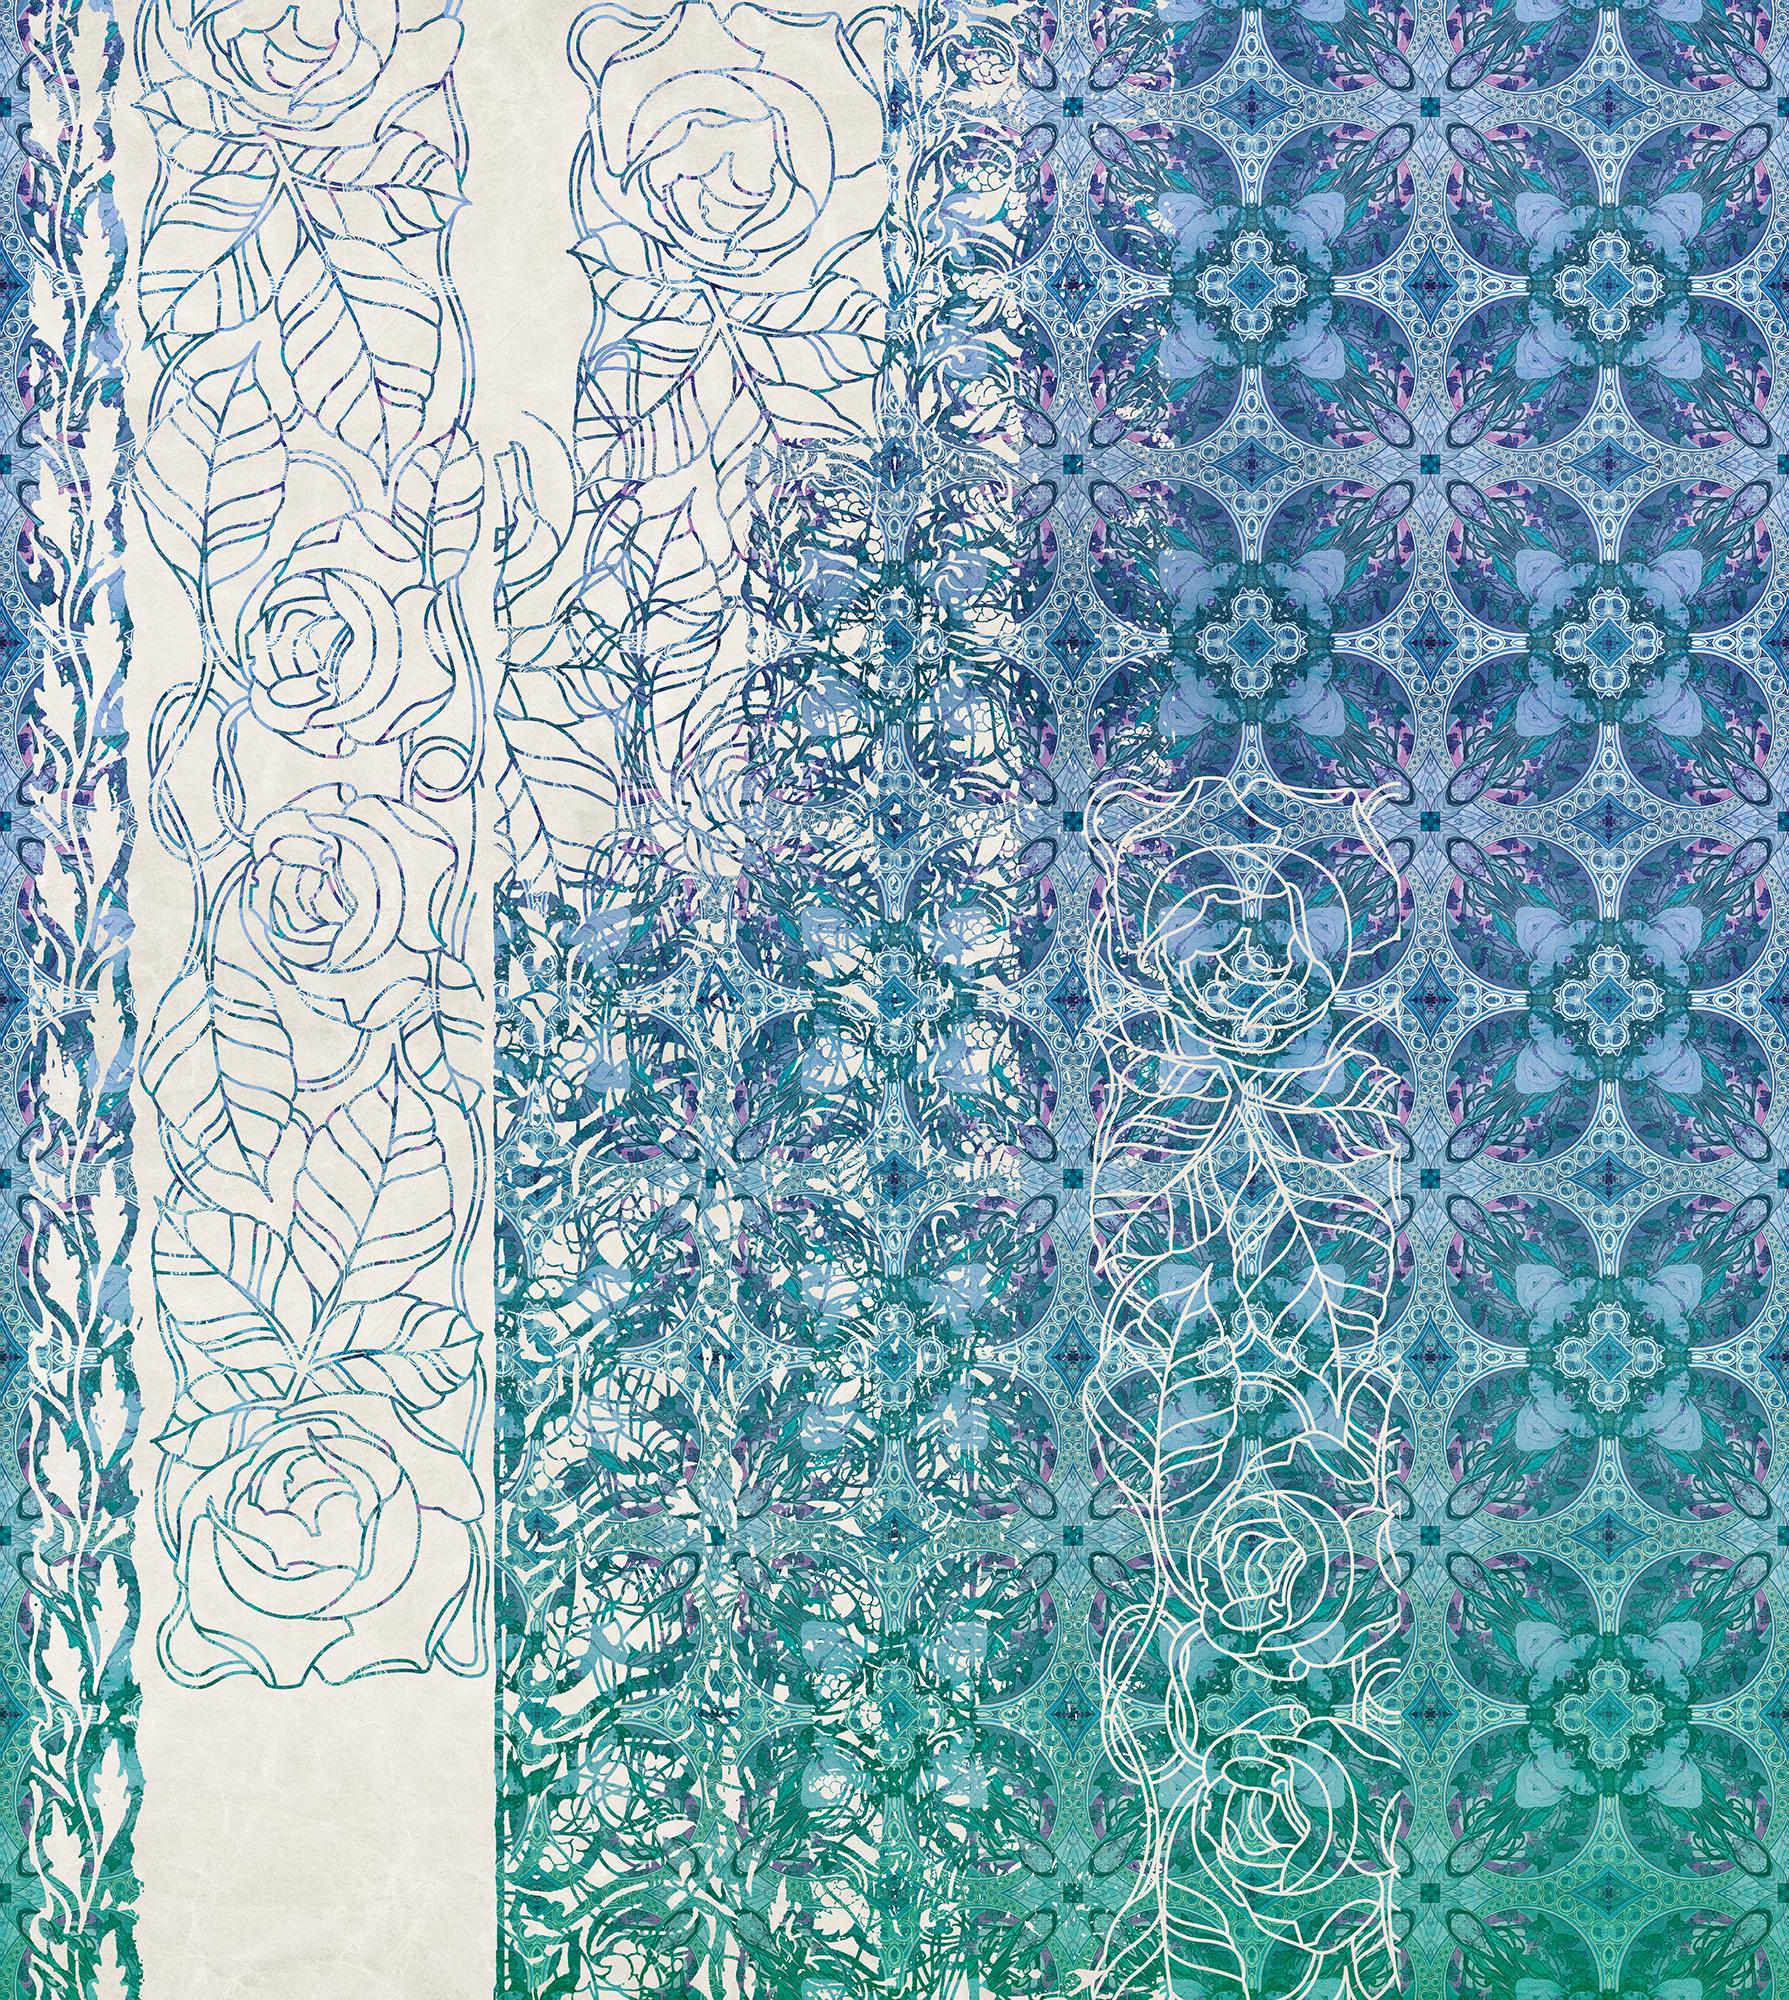 Heritage Edition 1 Fotobehang Komar - Bloemen behang ART NOUVEAU BLEU